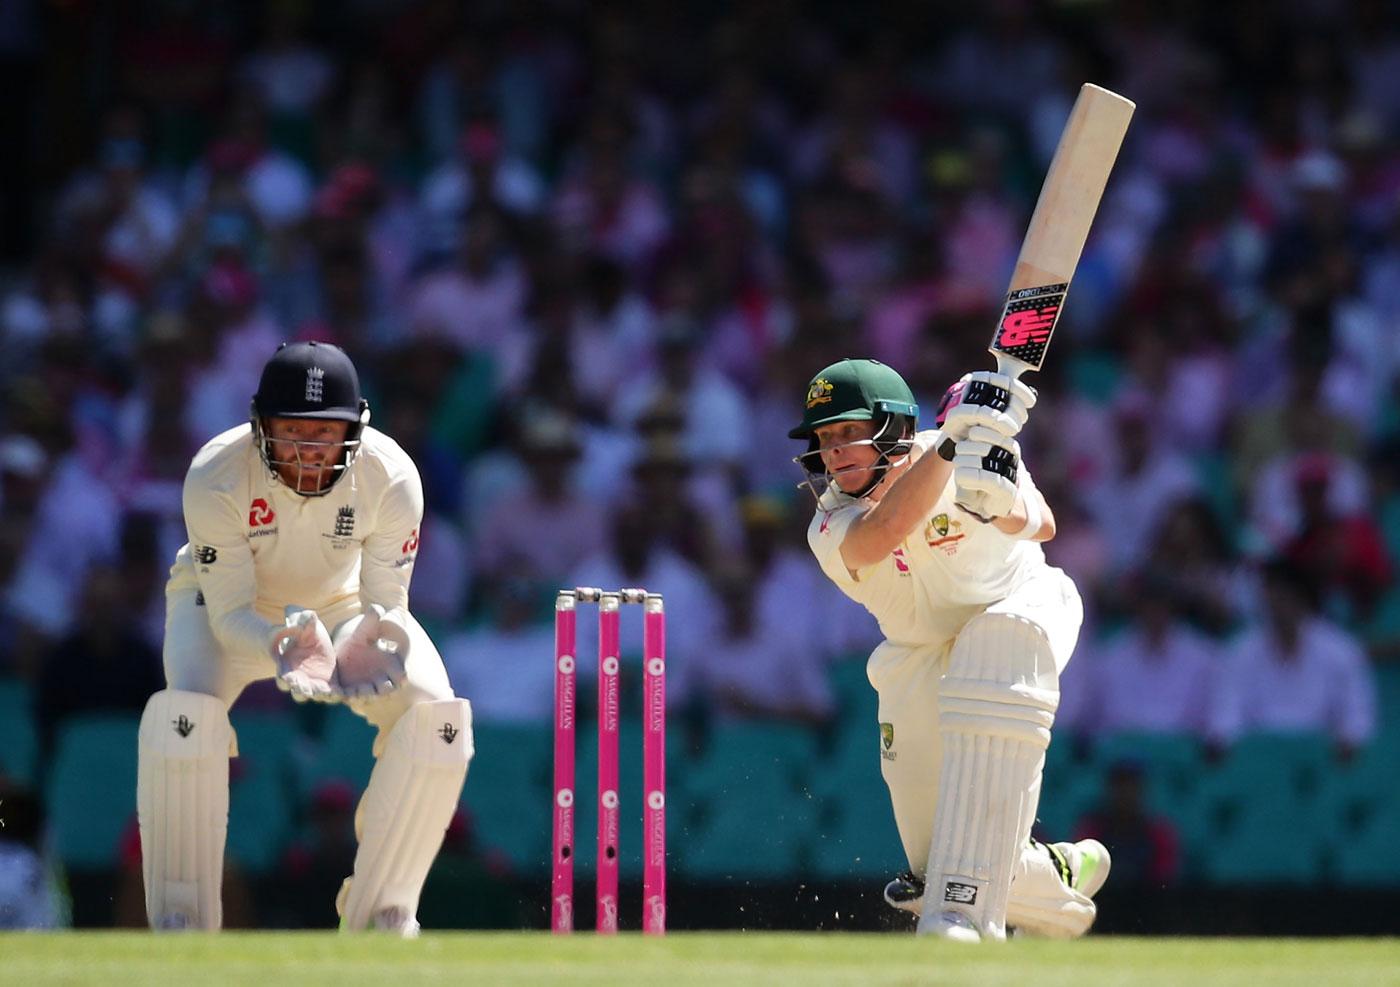 Australia vs England 5th Test Day 3 Highlights